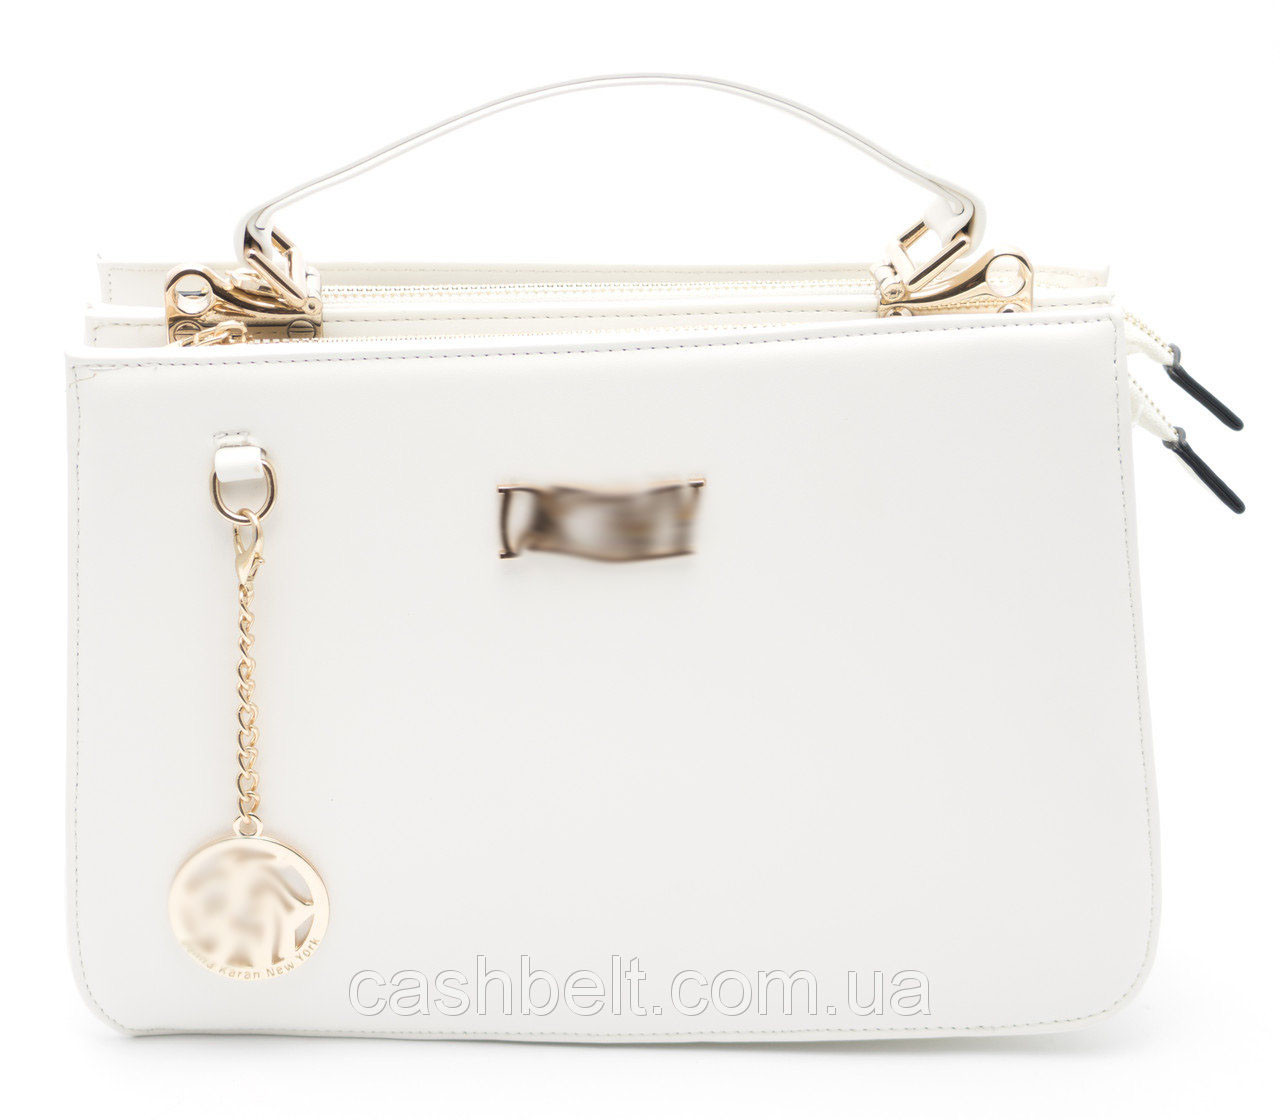 Стильная белая женская сумка DKNY art. 7099